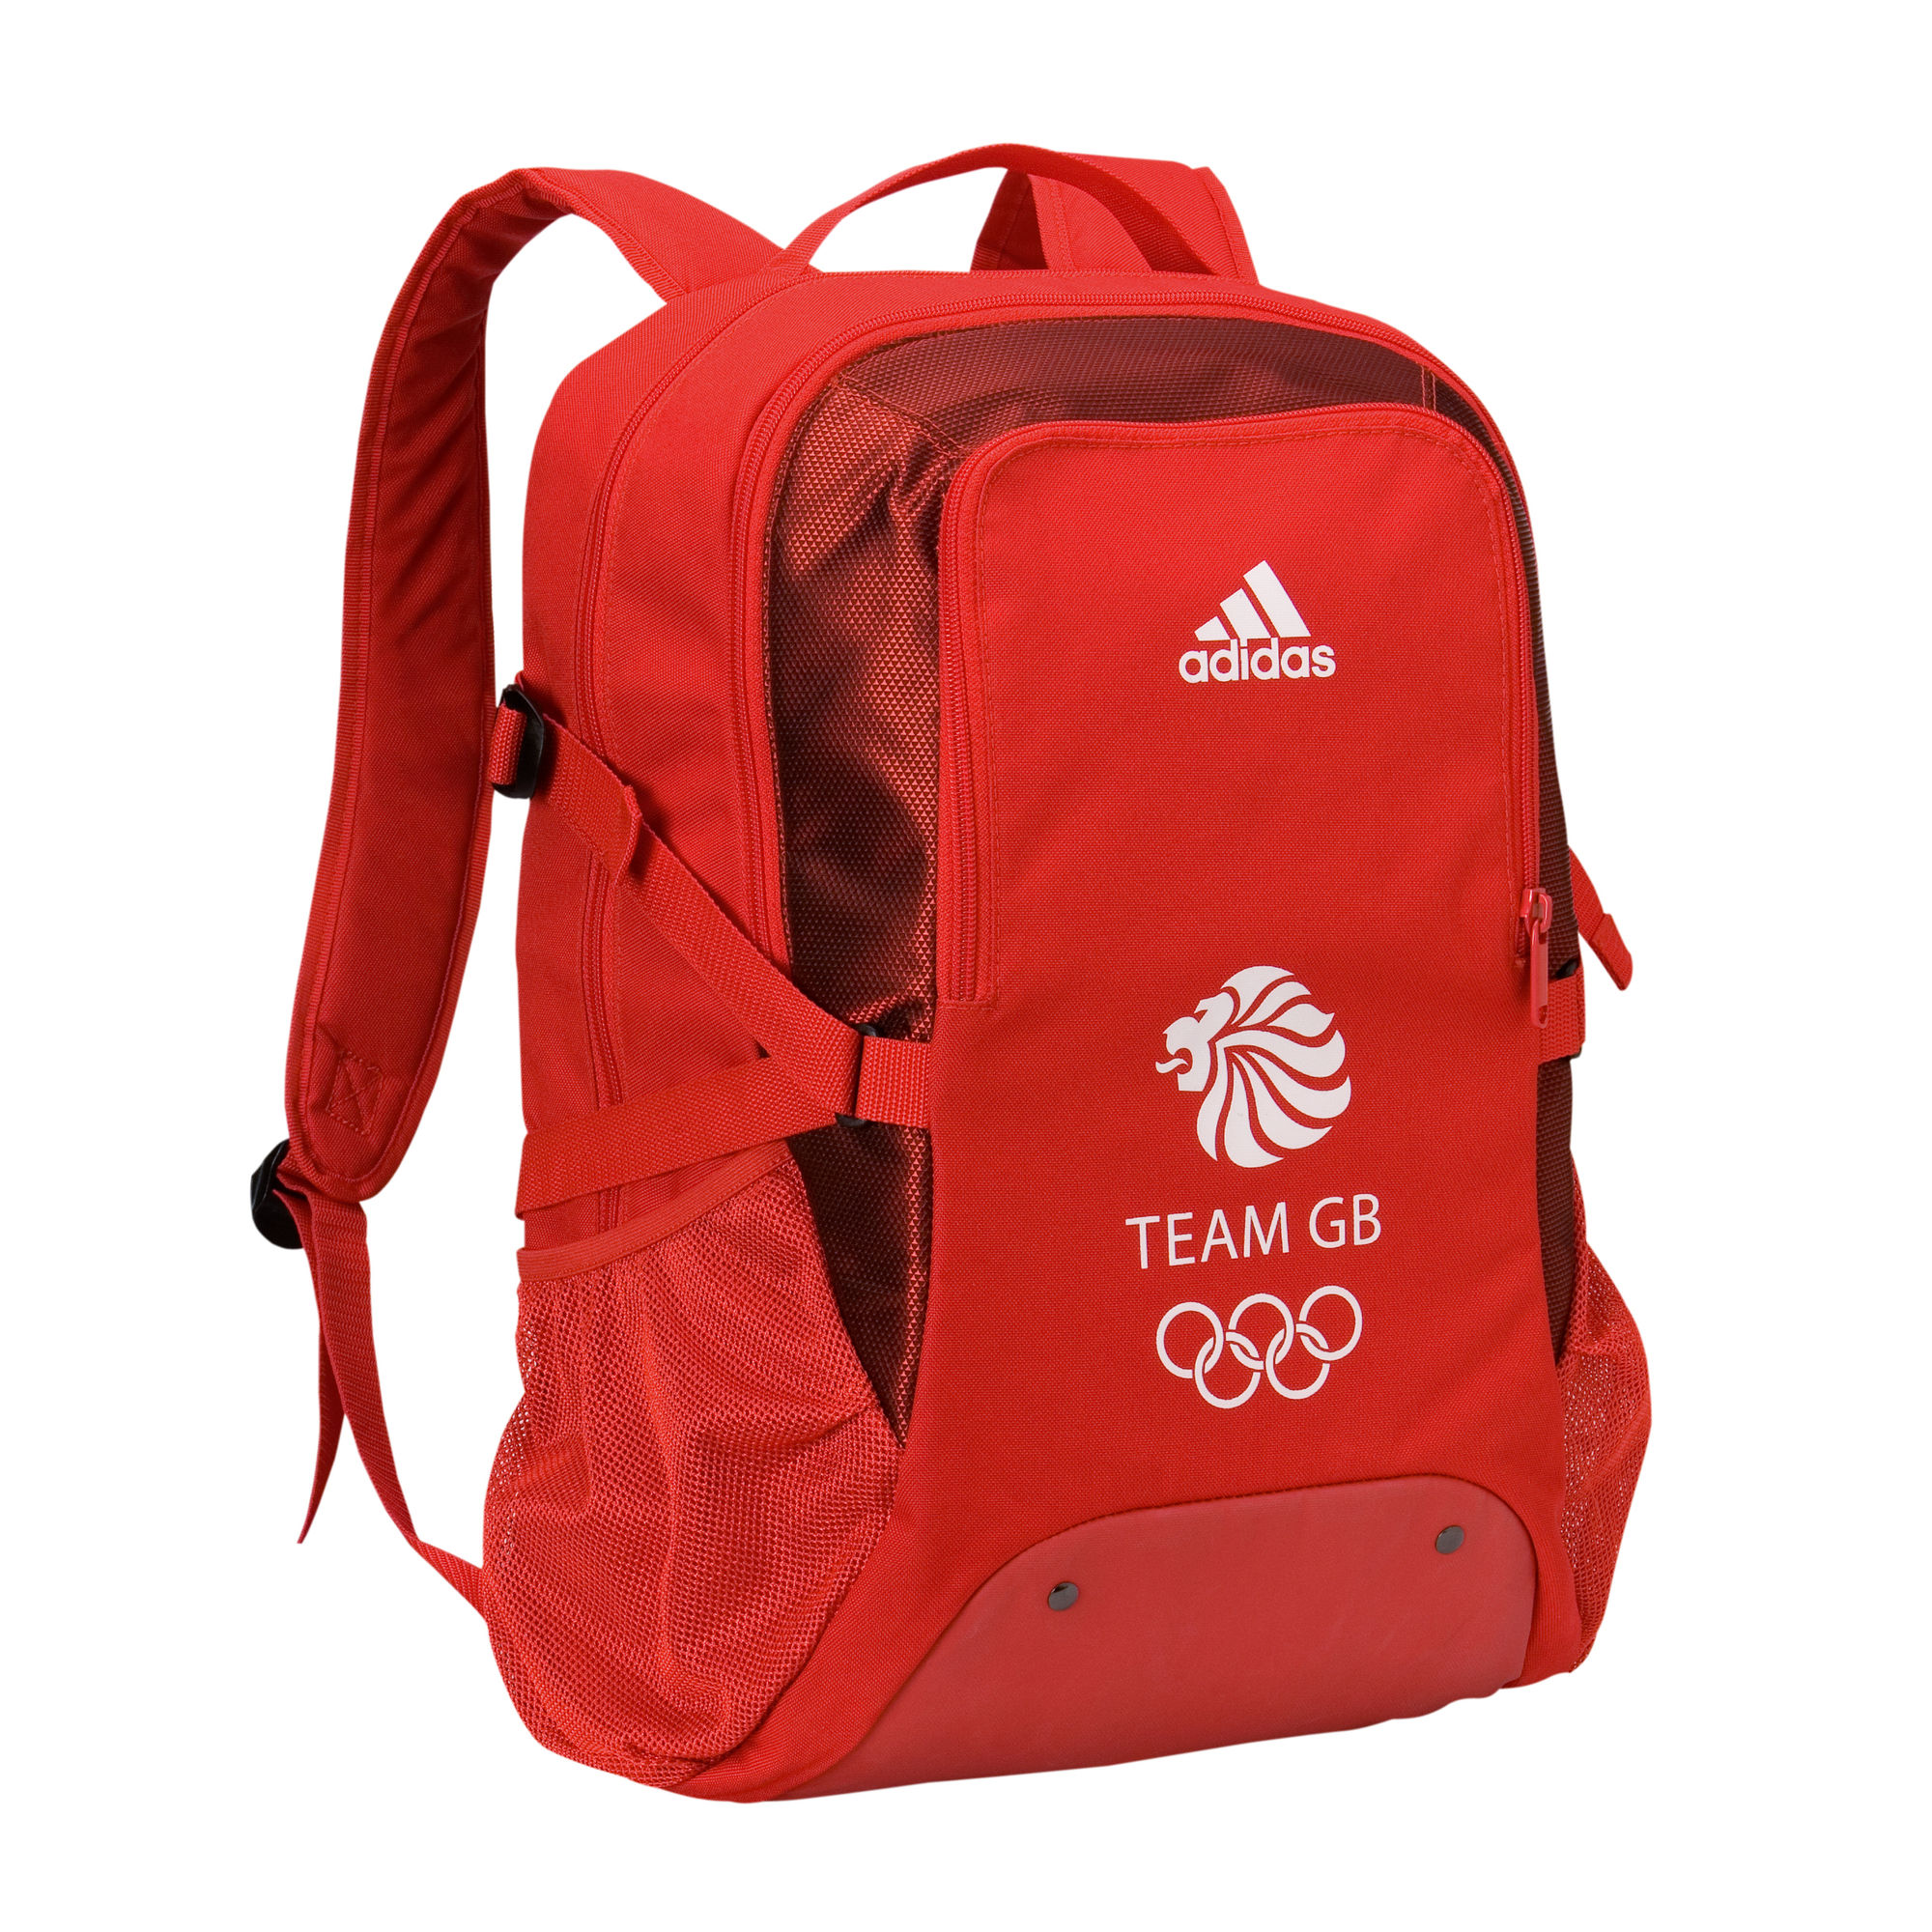 Adidas Soccer Team Backpacks- Fenix Toulouse Handball 4b1d91ac246c2